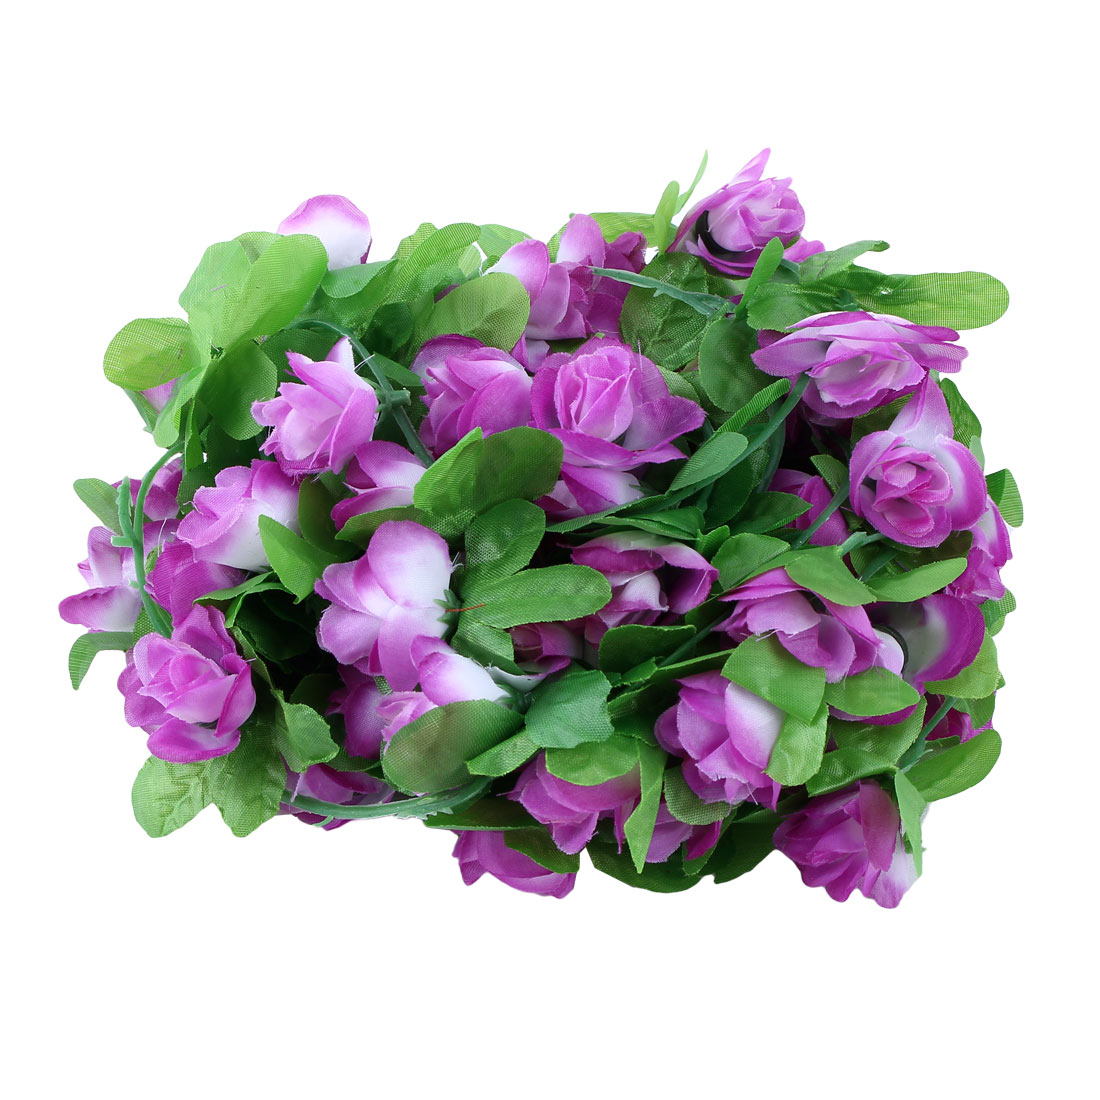 Home Plastic Artificial Flower Hanging Ivy Vine Purple White 7.2ft Length 2pcs